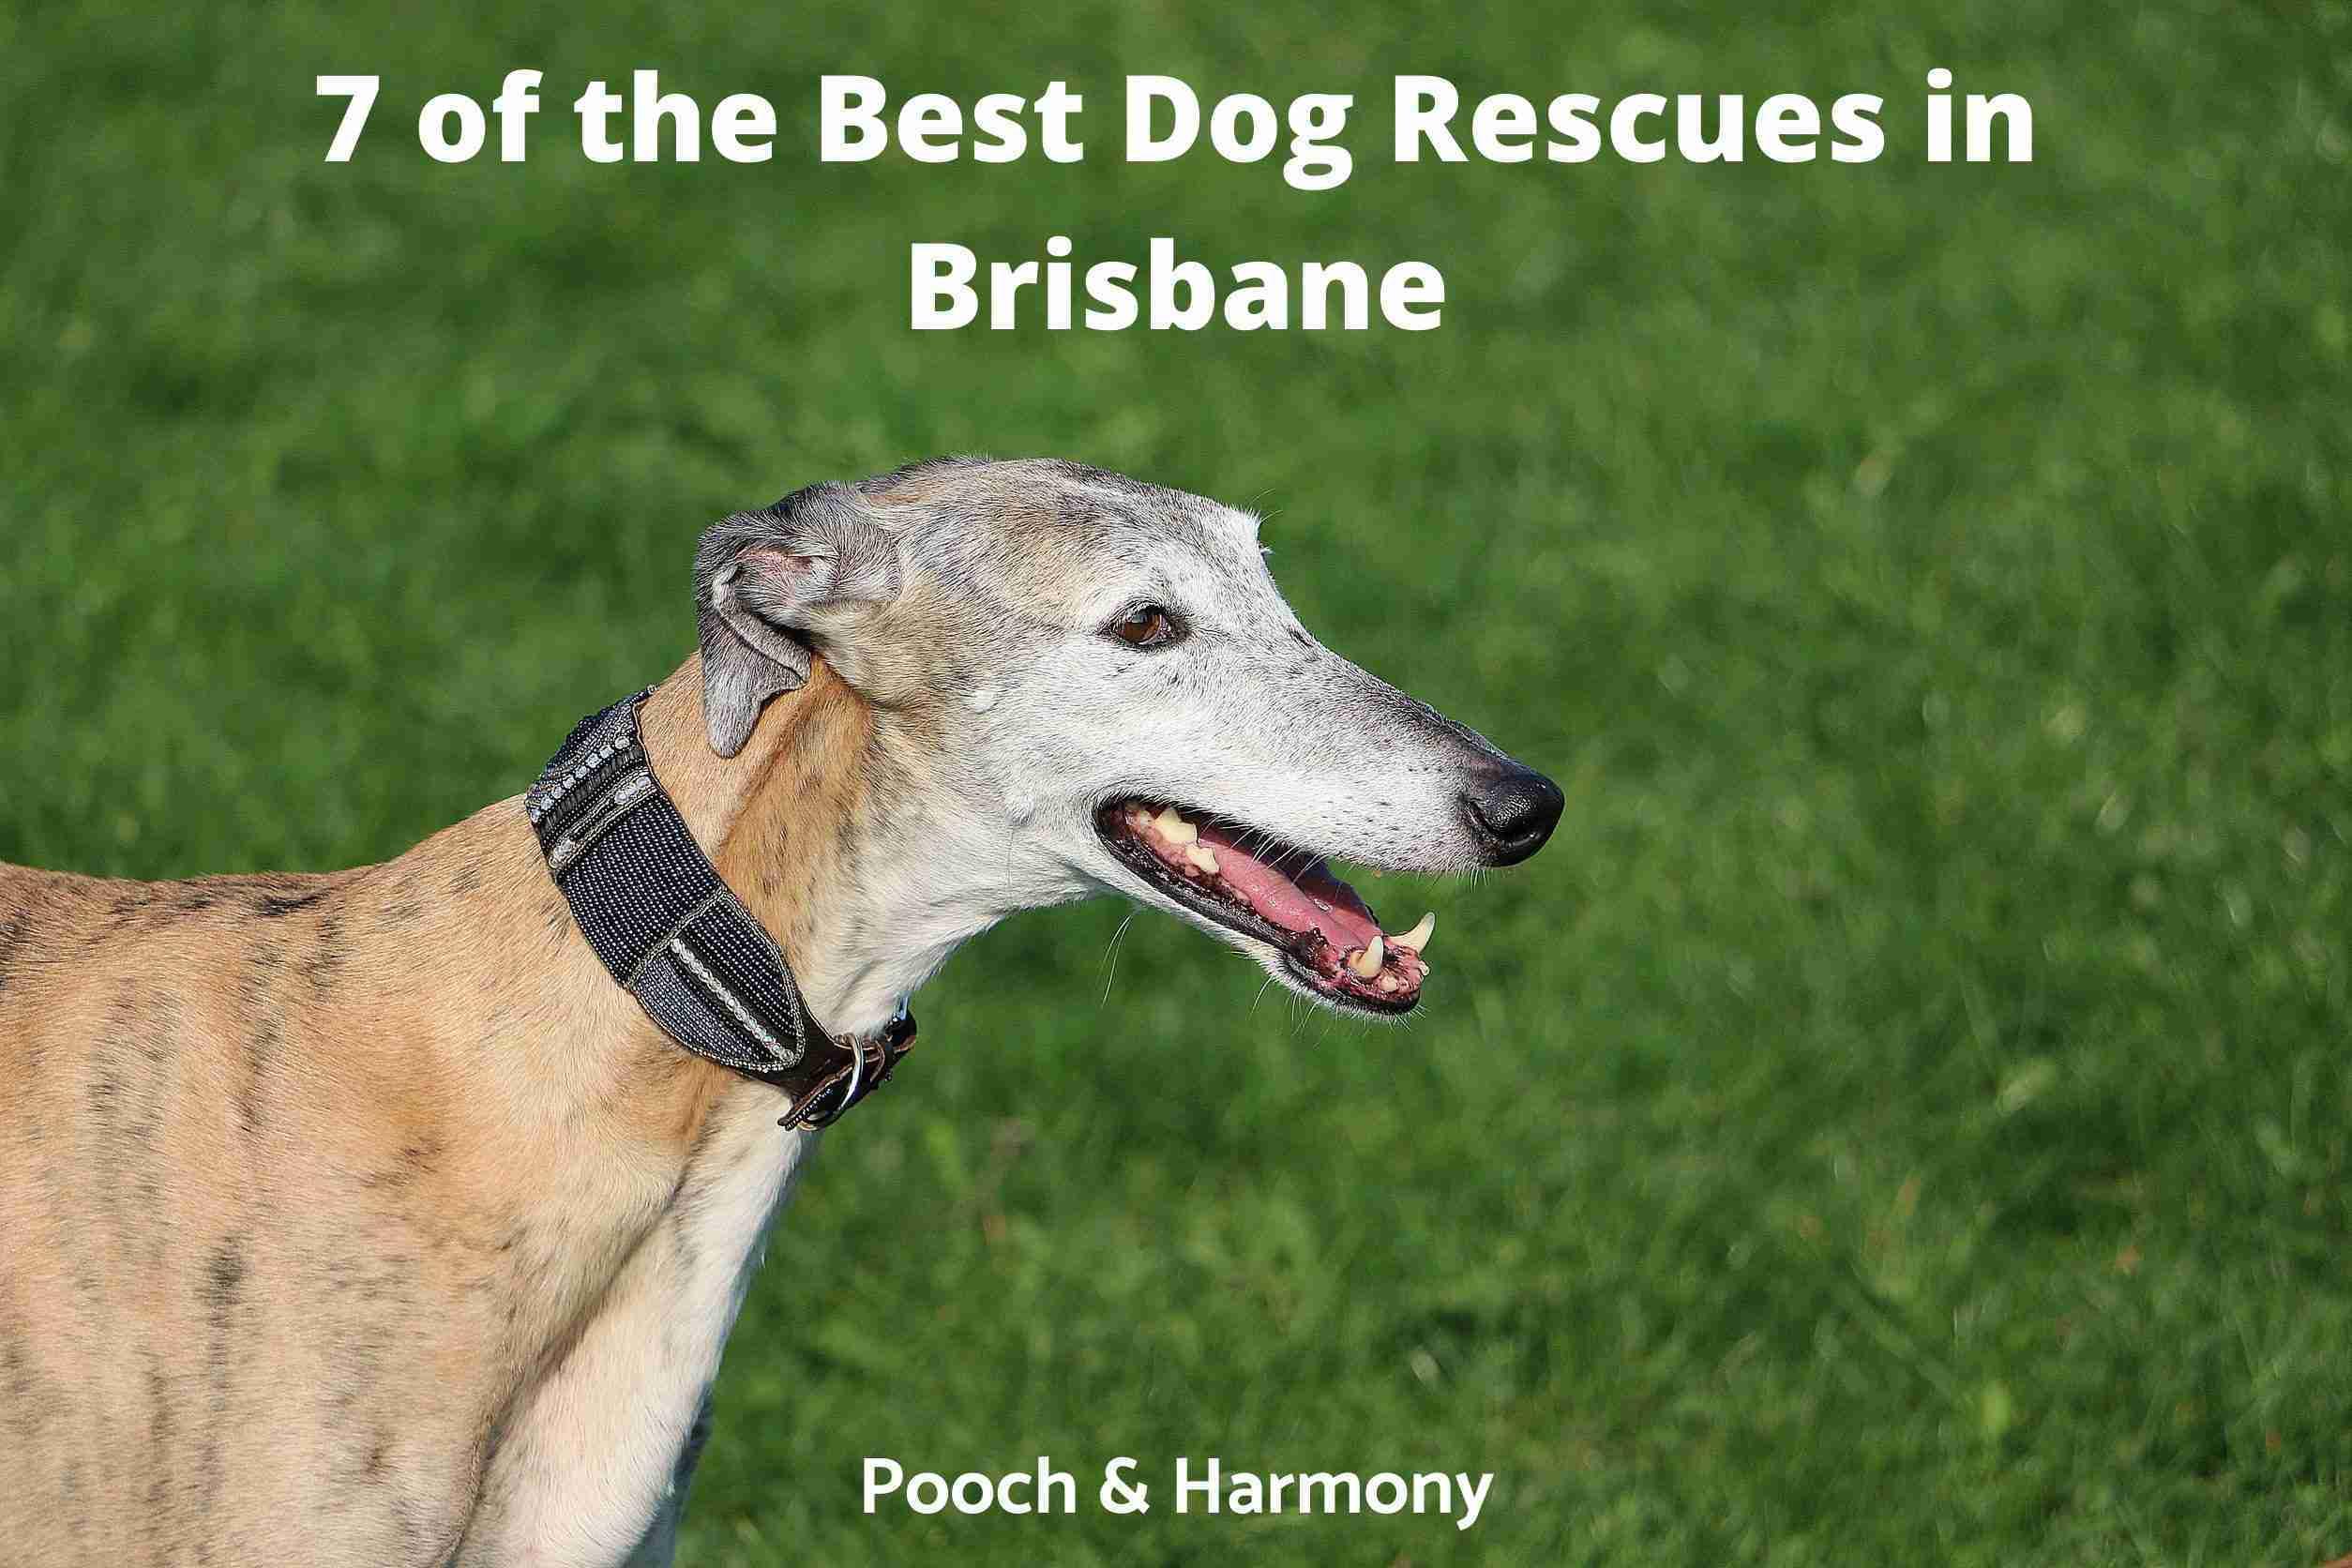 Best Dog Rescues in Brisbane